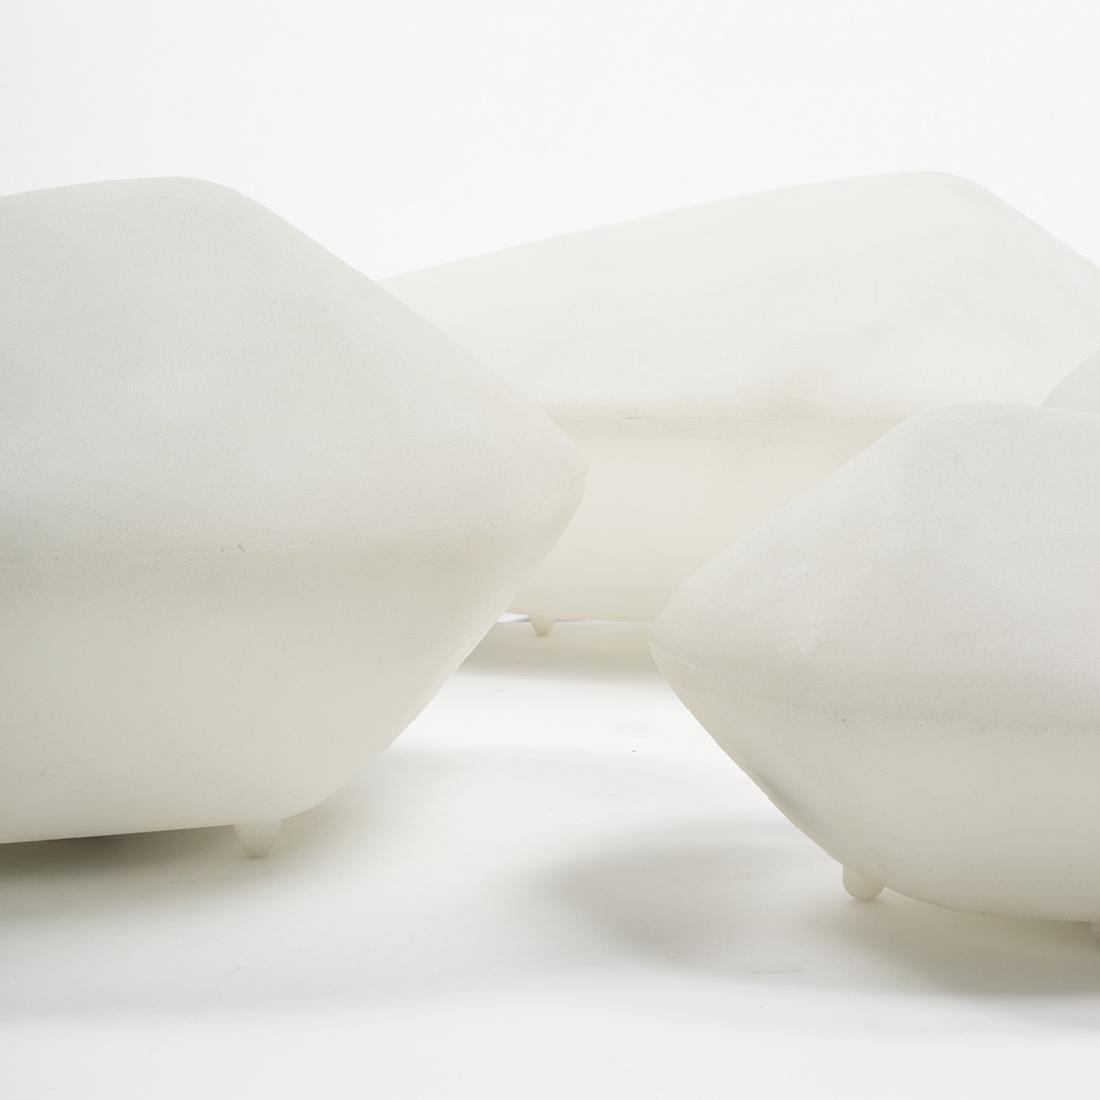 Oluce Stones Lamps (4) - 2